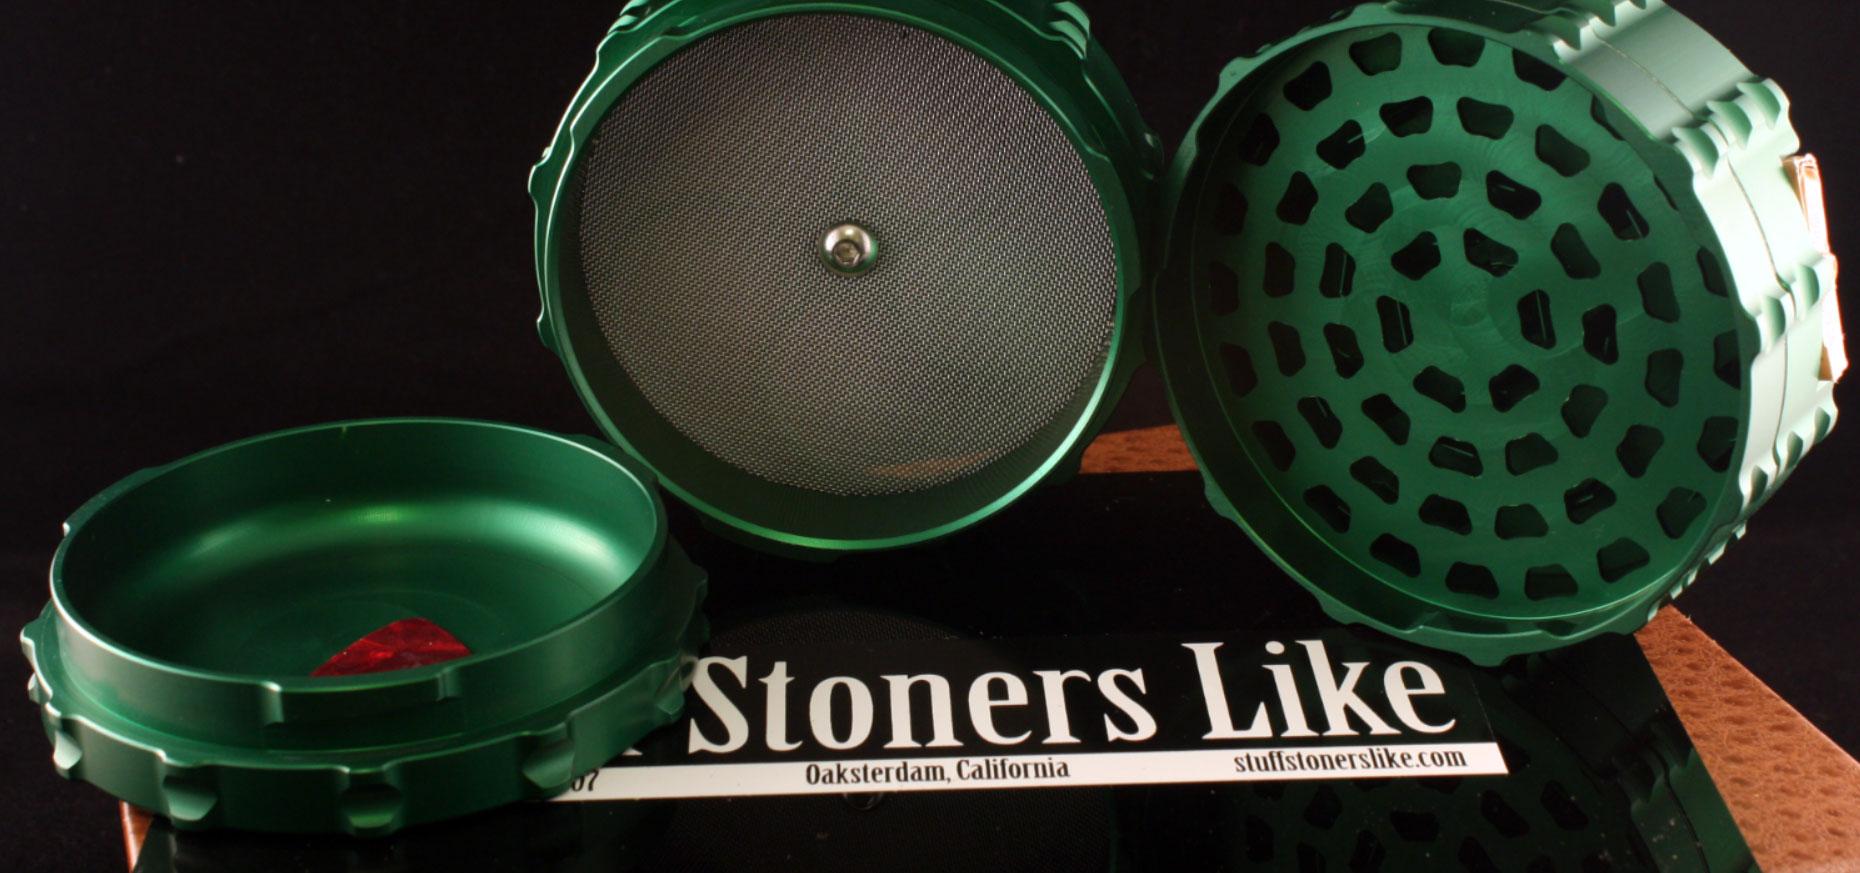 Phoenician Weed Grinder - STUFF STONERS LIKE